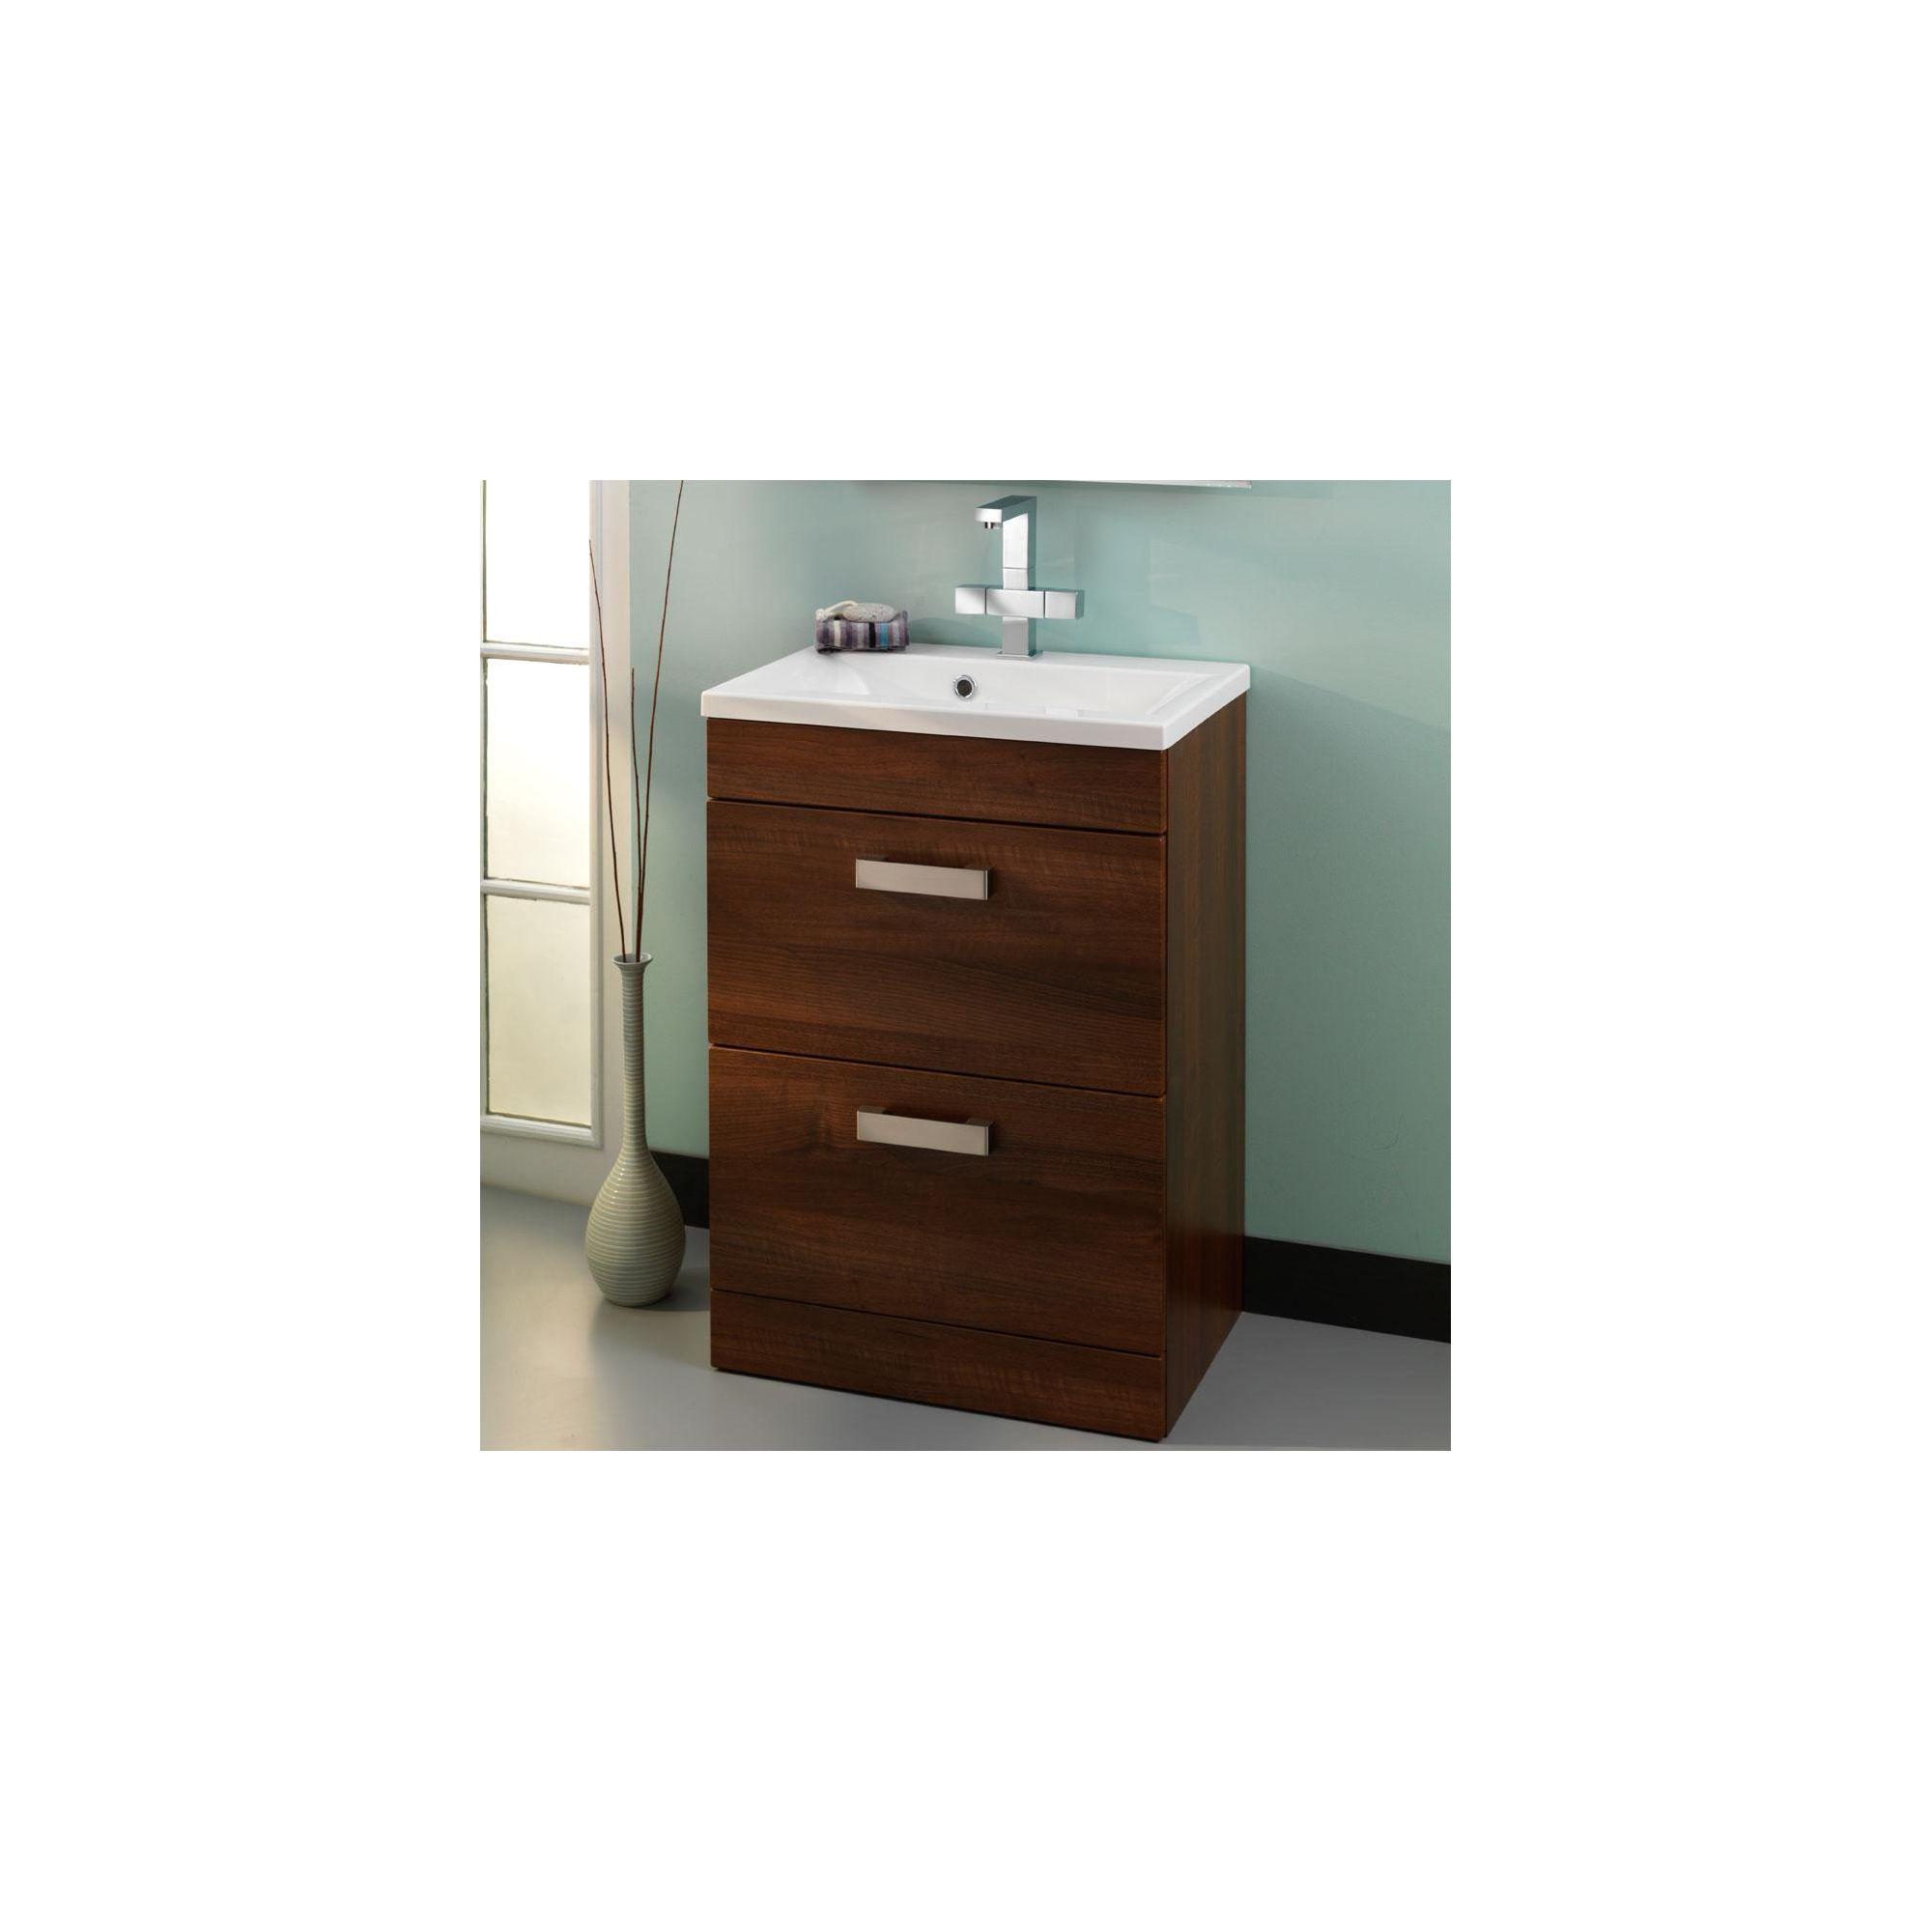 Duchy Tredrea Walnut Floor Standing 2 Drawer Vanity Unit and Basin - 580mm Wide x 393mm Deep